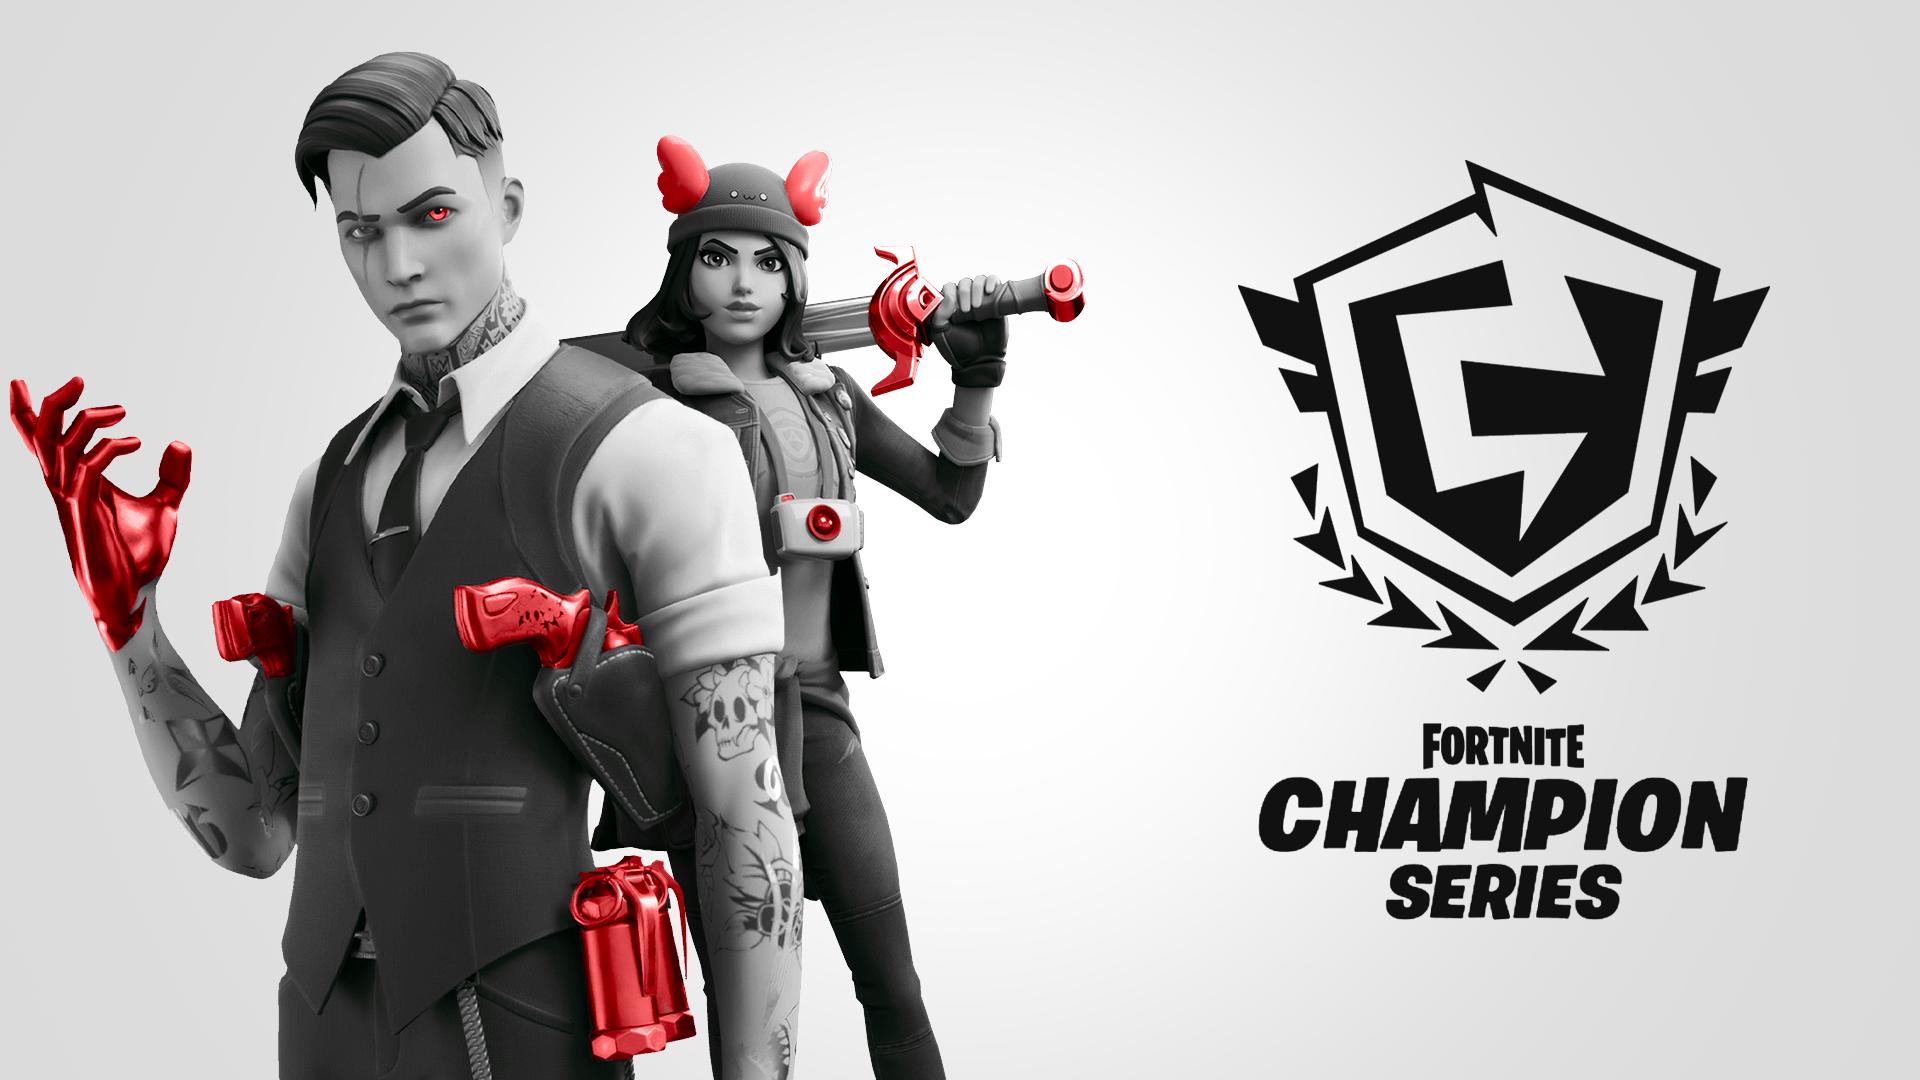 Fortnite Champion Series Week One Summary